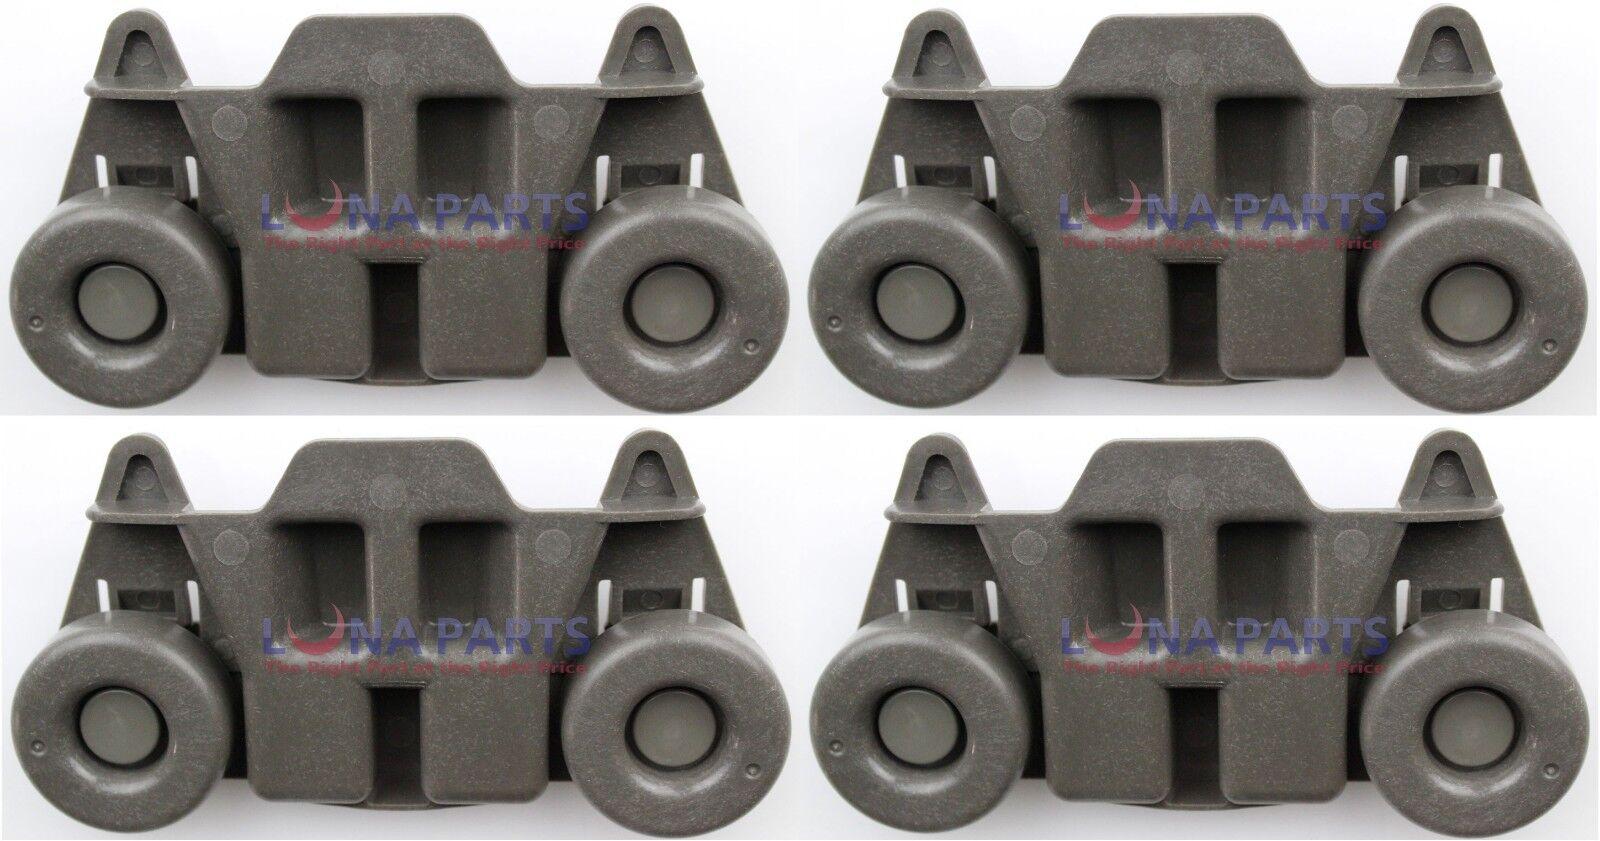 4 Packs W10195416 UPGRADED Dishwasher Wheels Lower Rack W10195416V For Kitche.